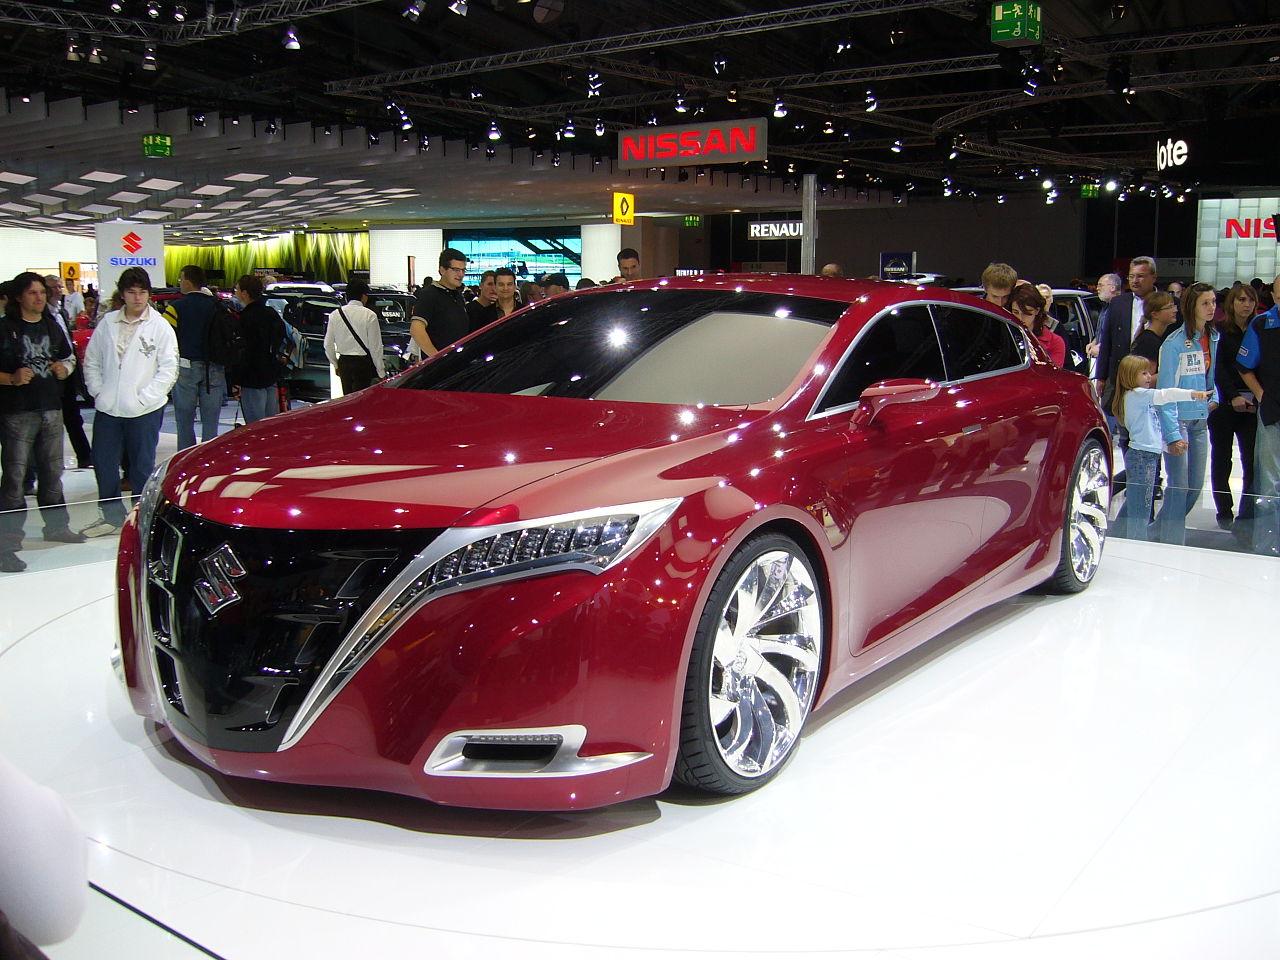 https://upload.wikimedia.org/wikipedia/commons/thumb/d/db/Suzuki_Concept_Kizashi_Front03.JPG/1280px-Suzuki_Concept_Kizashi_Front03.JPG